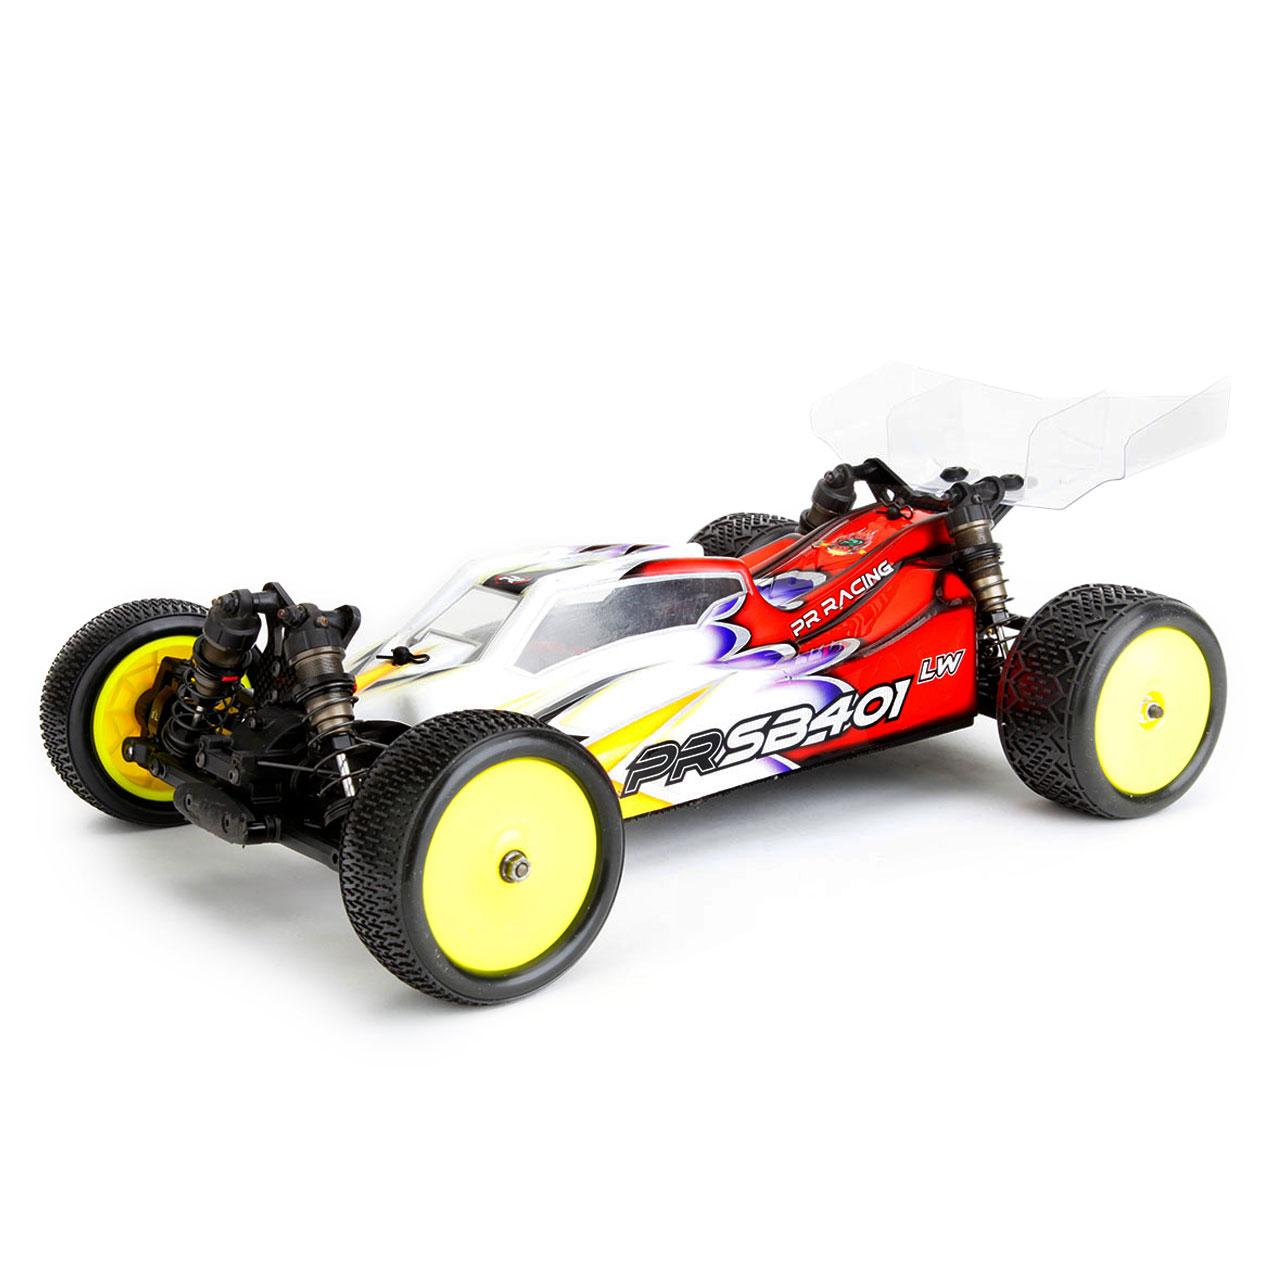 PR Racing 4WD Offroad Buggy SB401 1/10